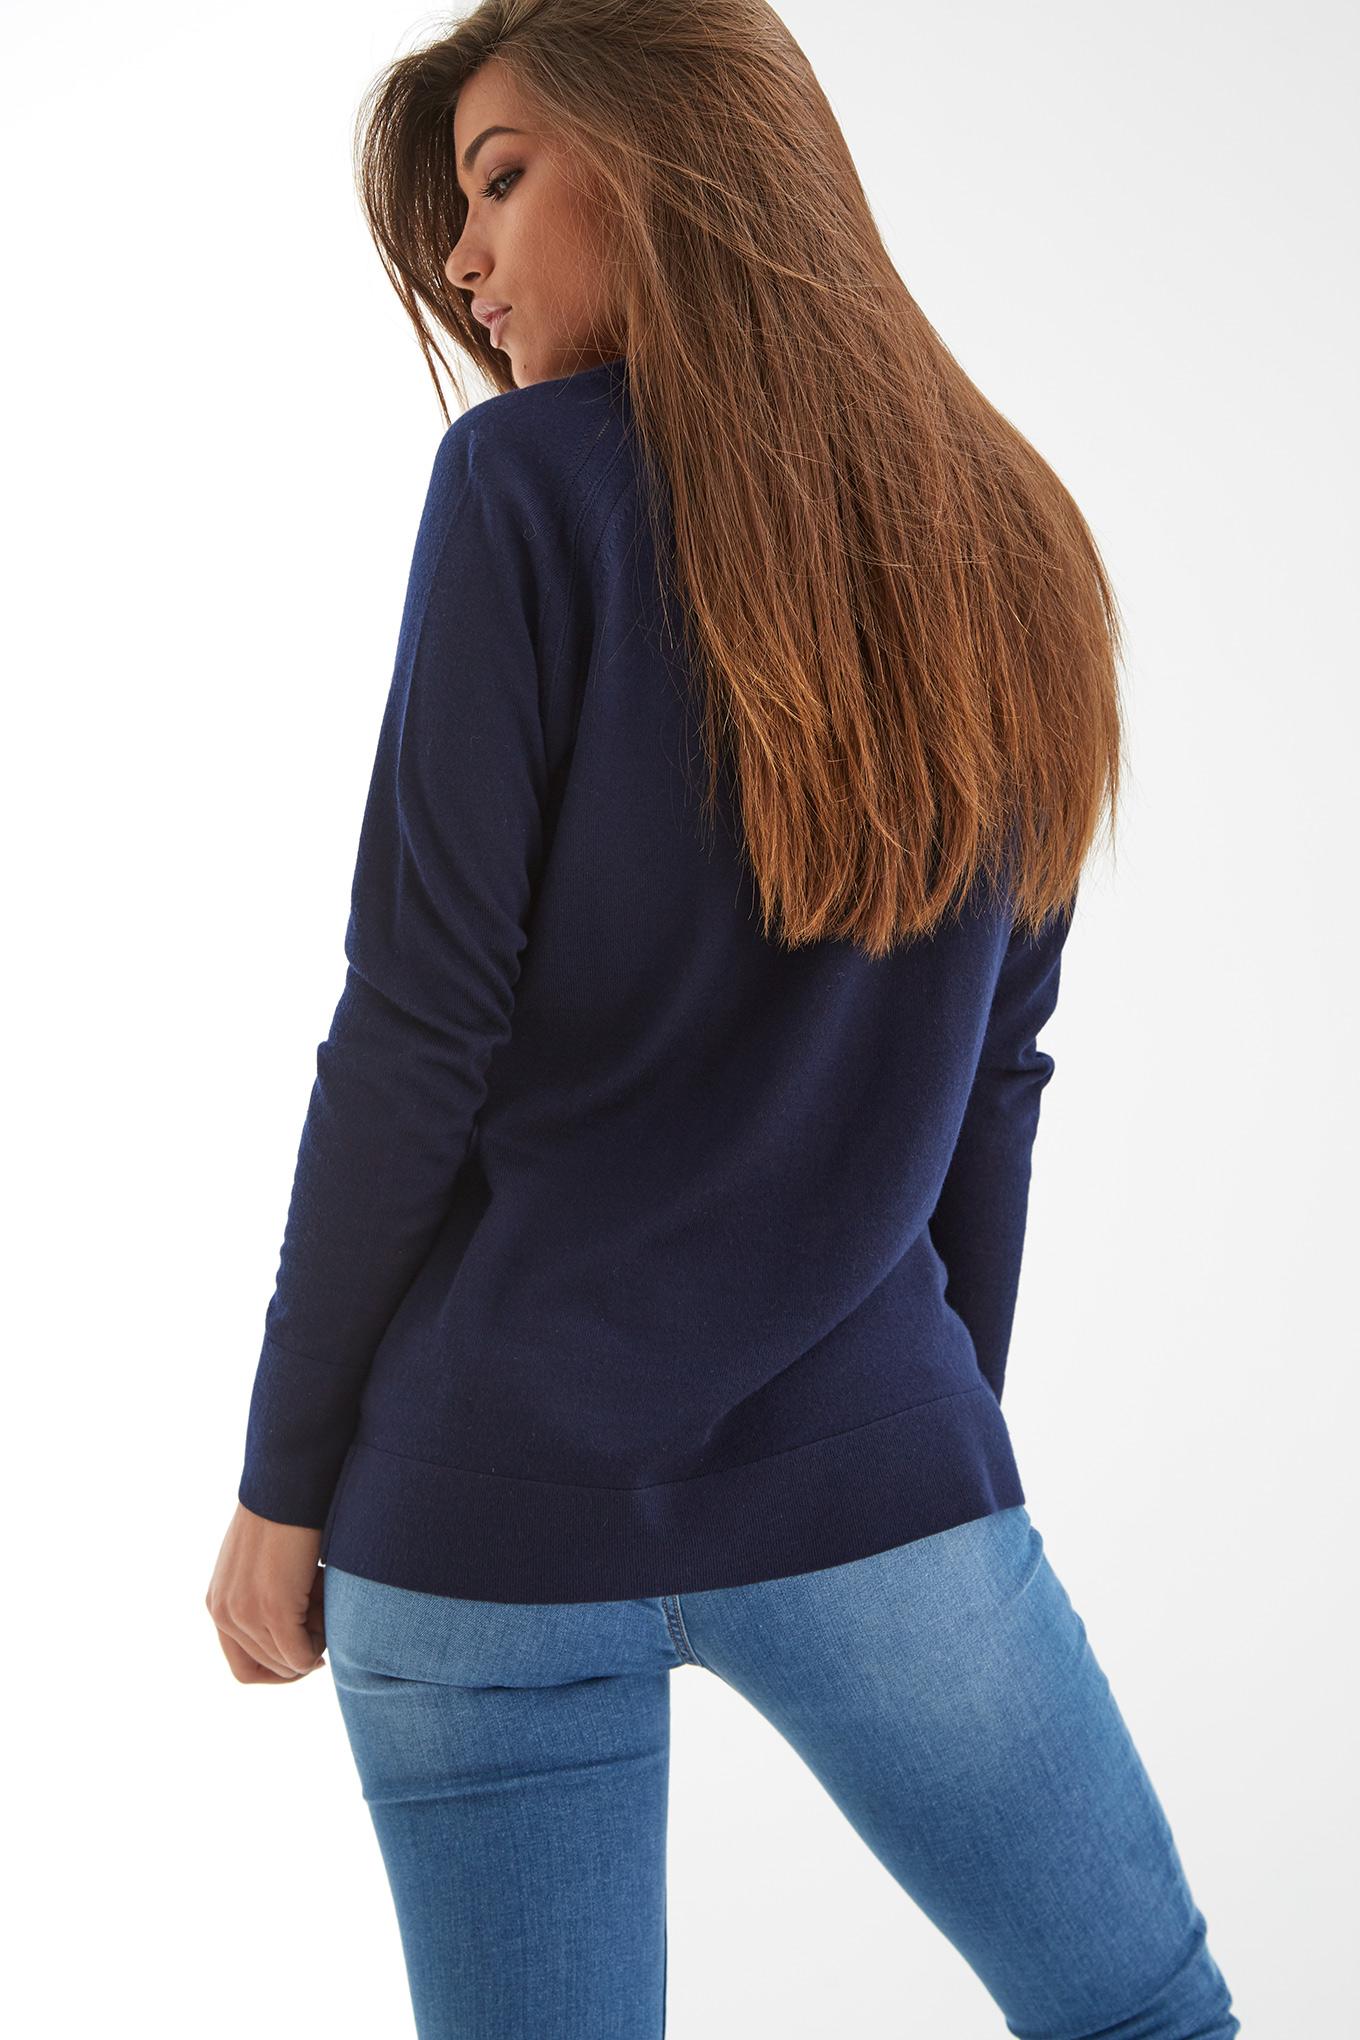 Malha Azul Escuro Casual Mulher